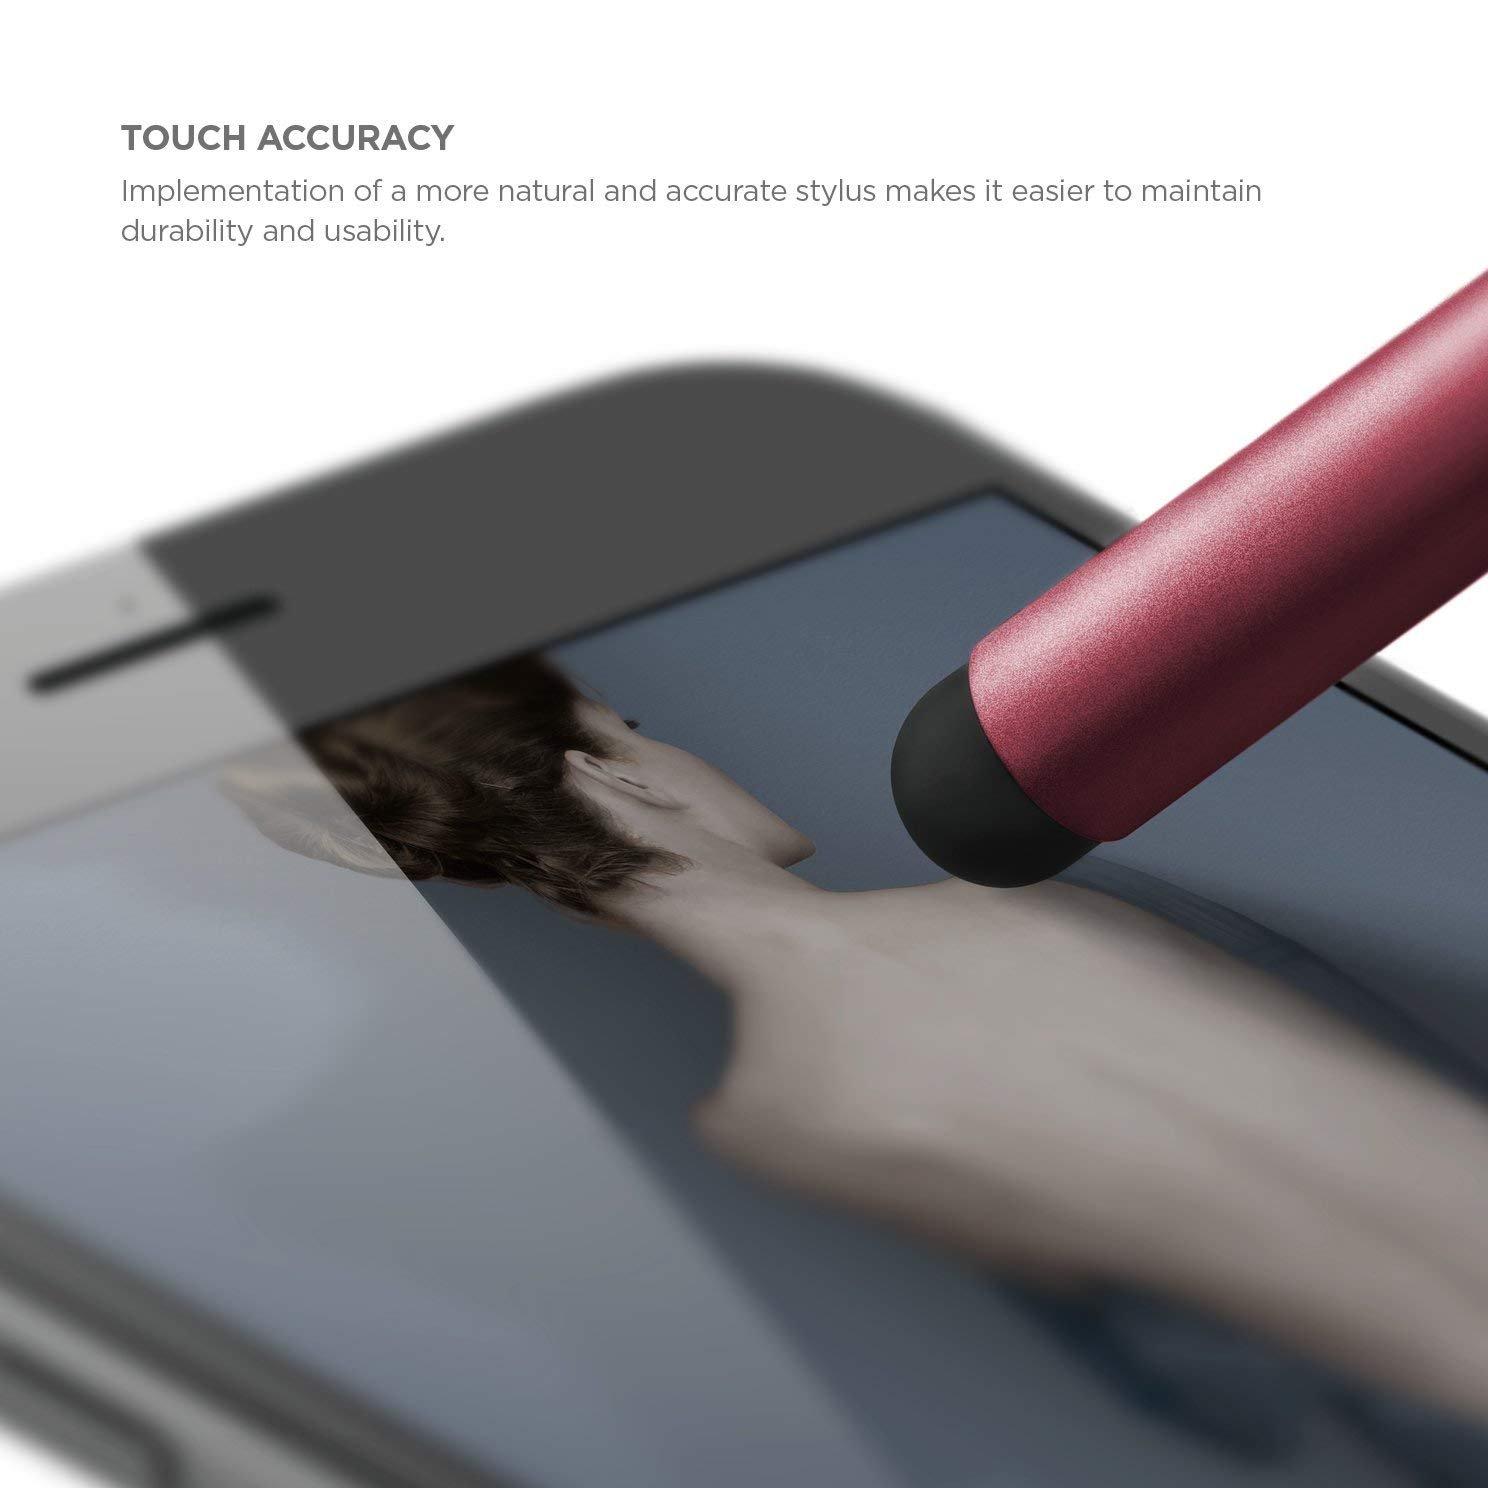 Amazon.com: elago - Lápiz capacitivo (aluminio, punta ...